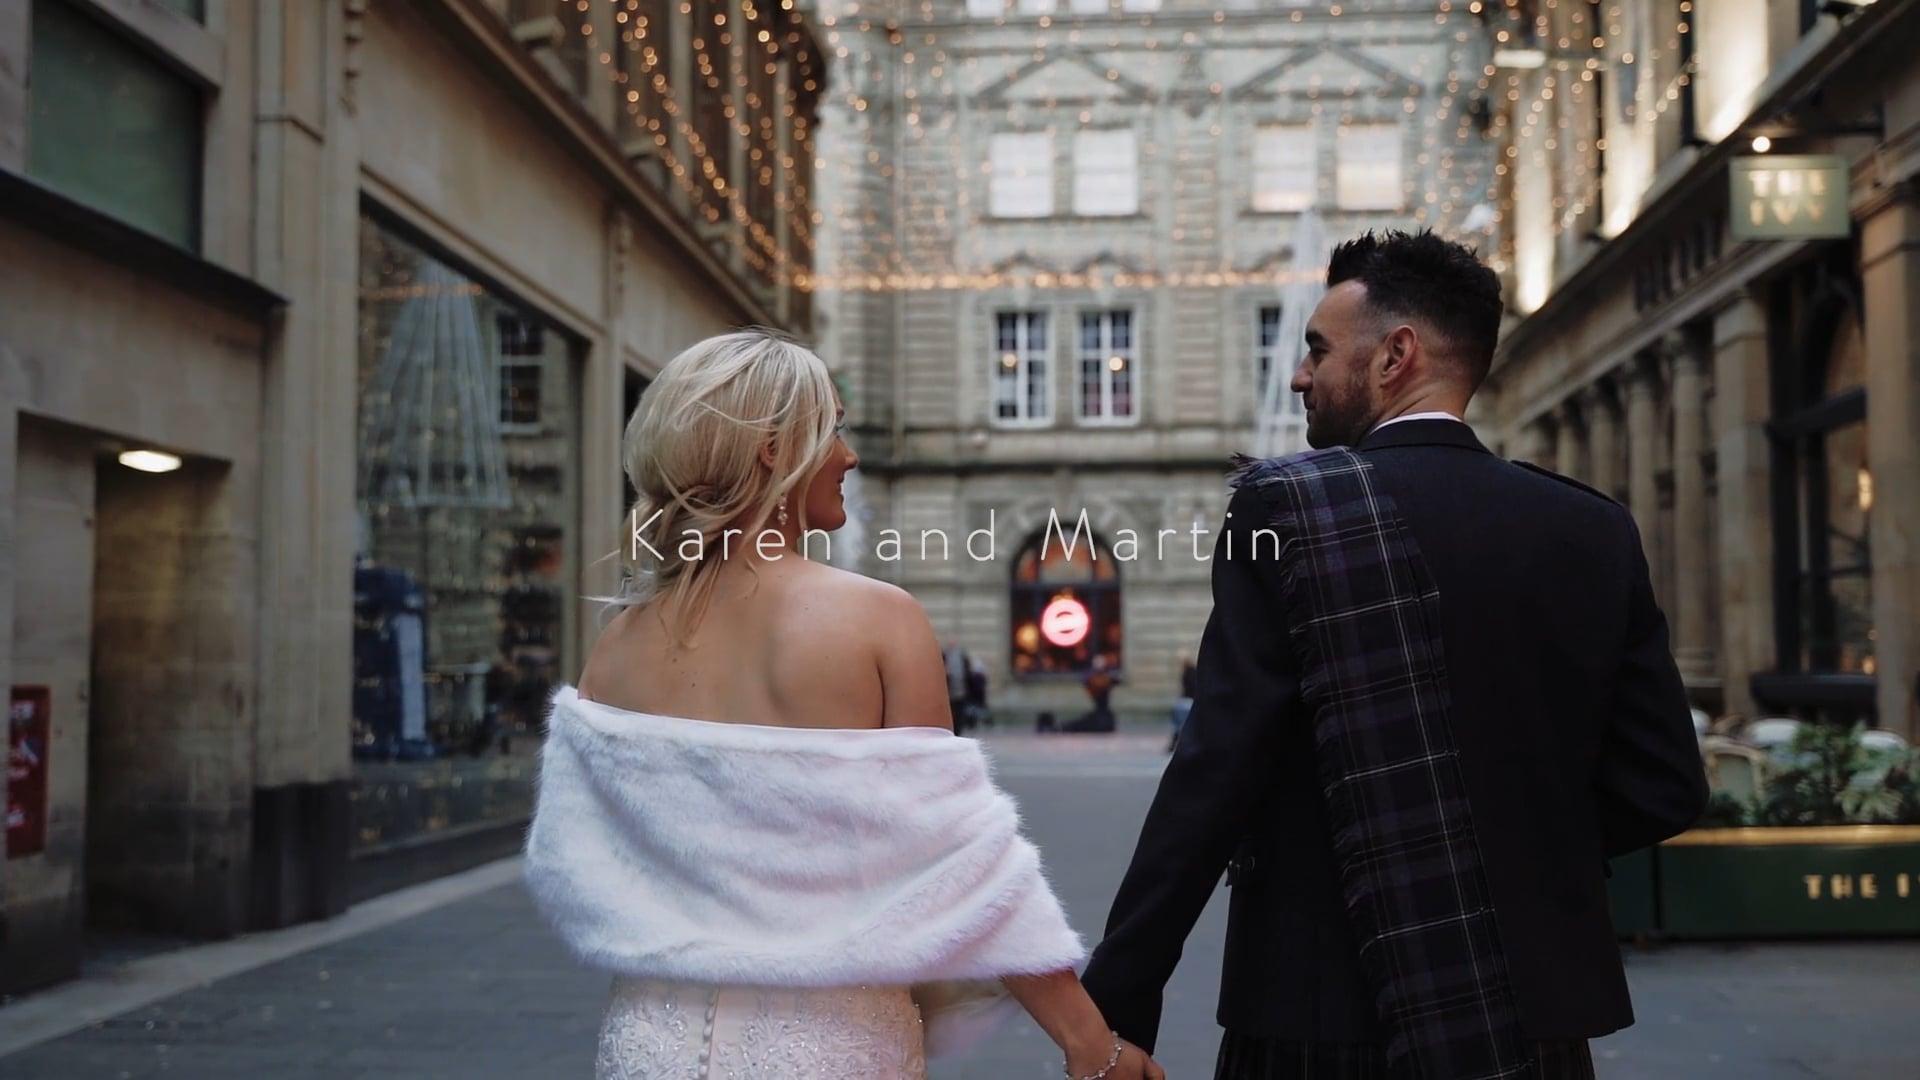 Karen and Martin - 29 Glasgow (Cinematic Highlights)